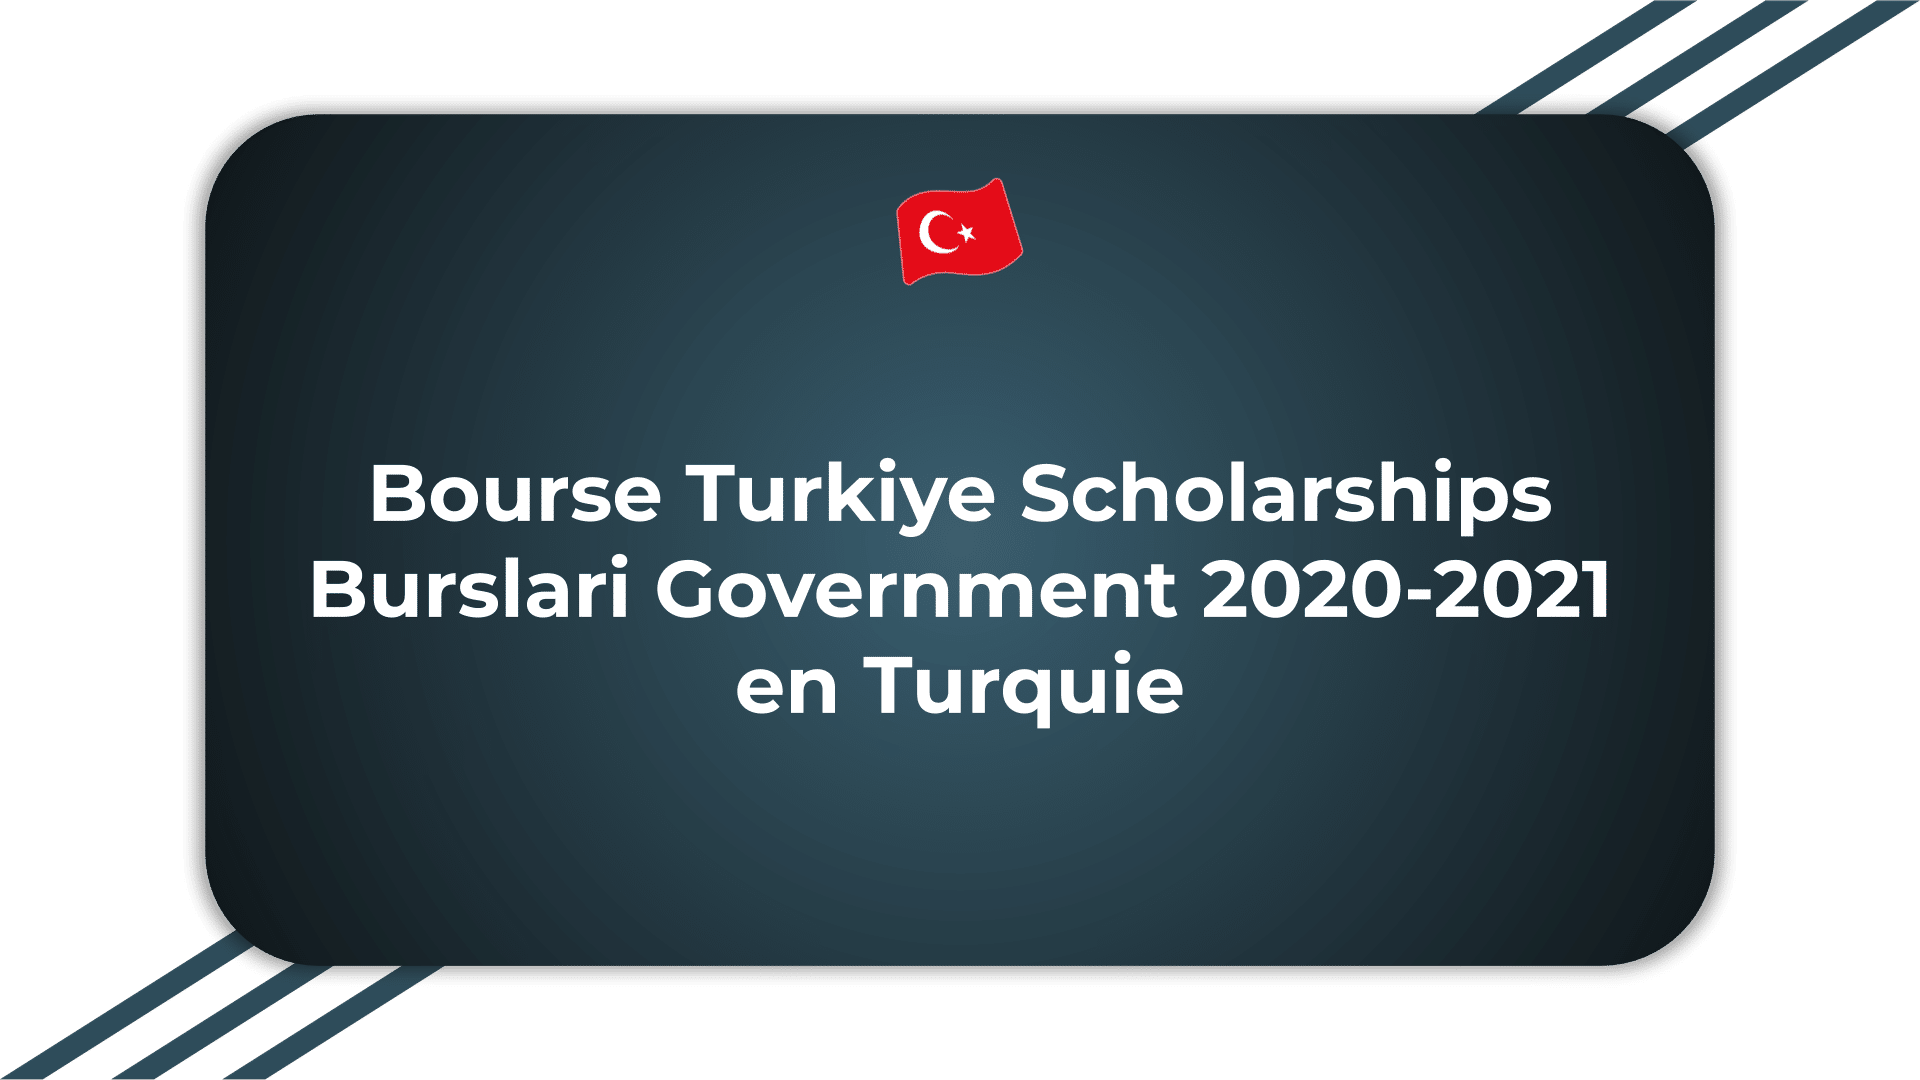 Bourse Turkiye Scholarships Burslari Government